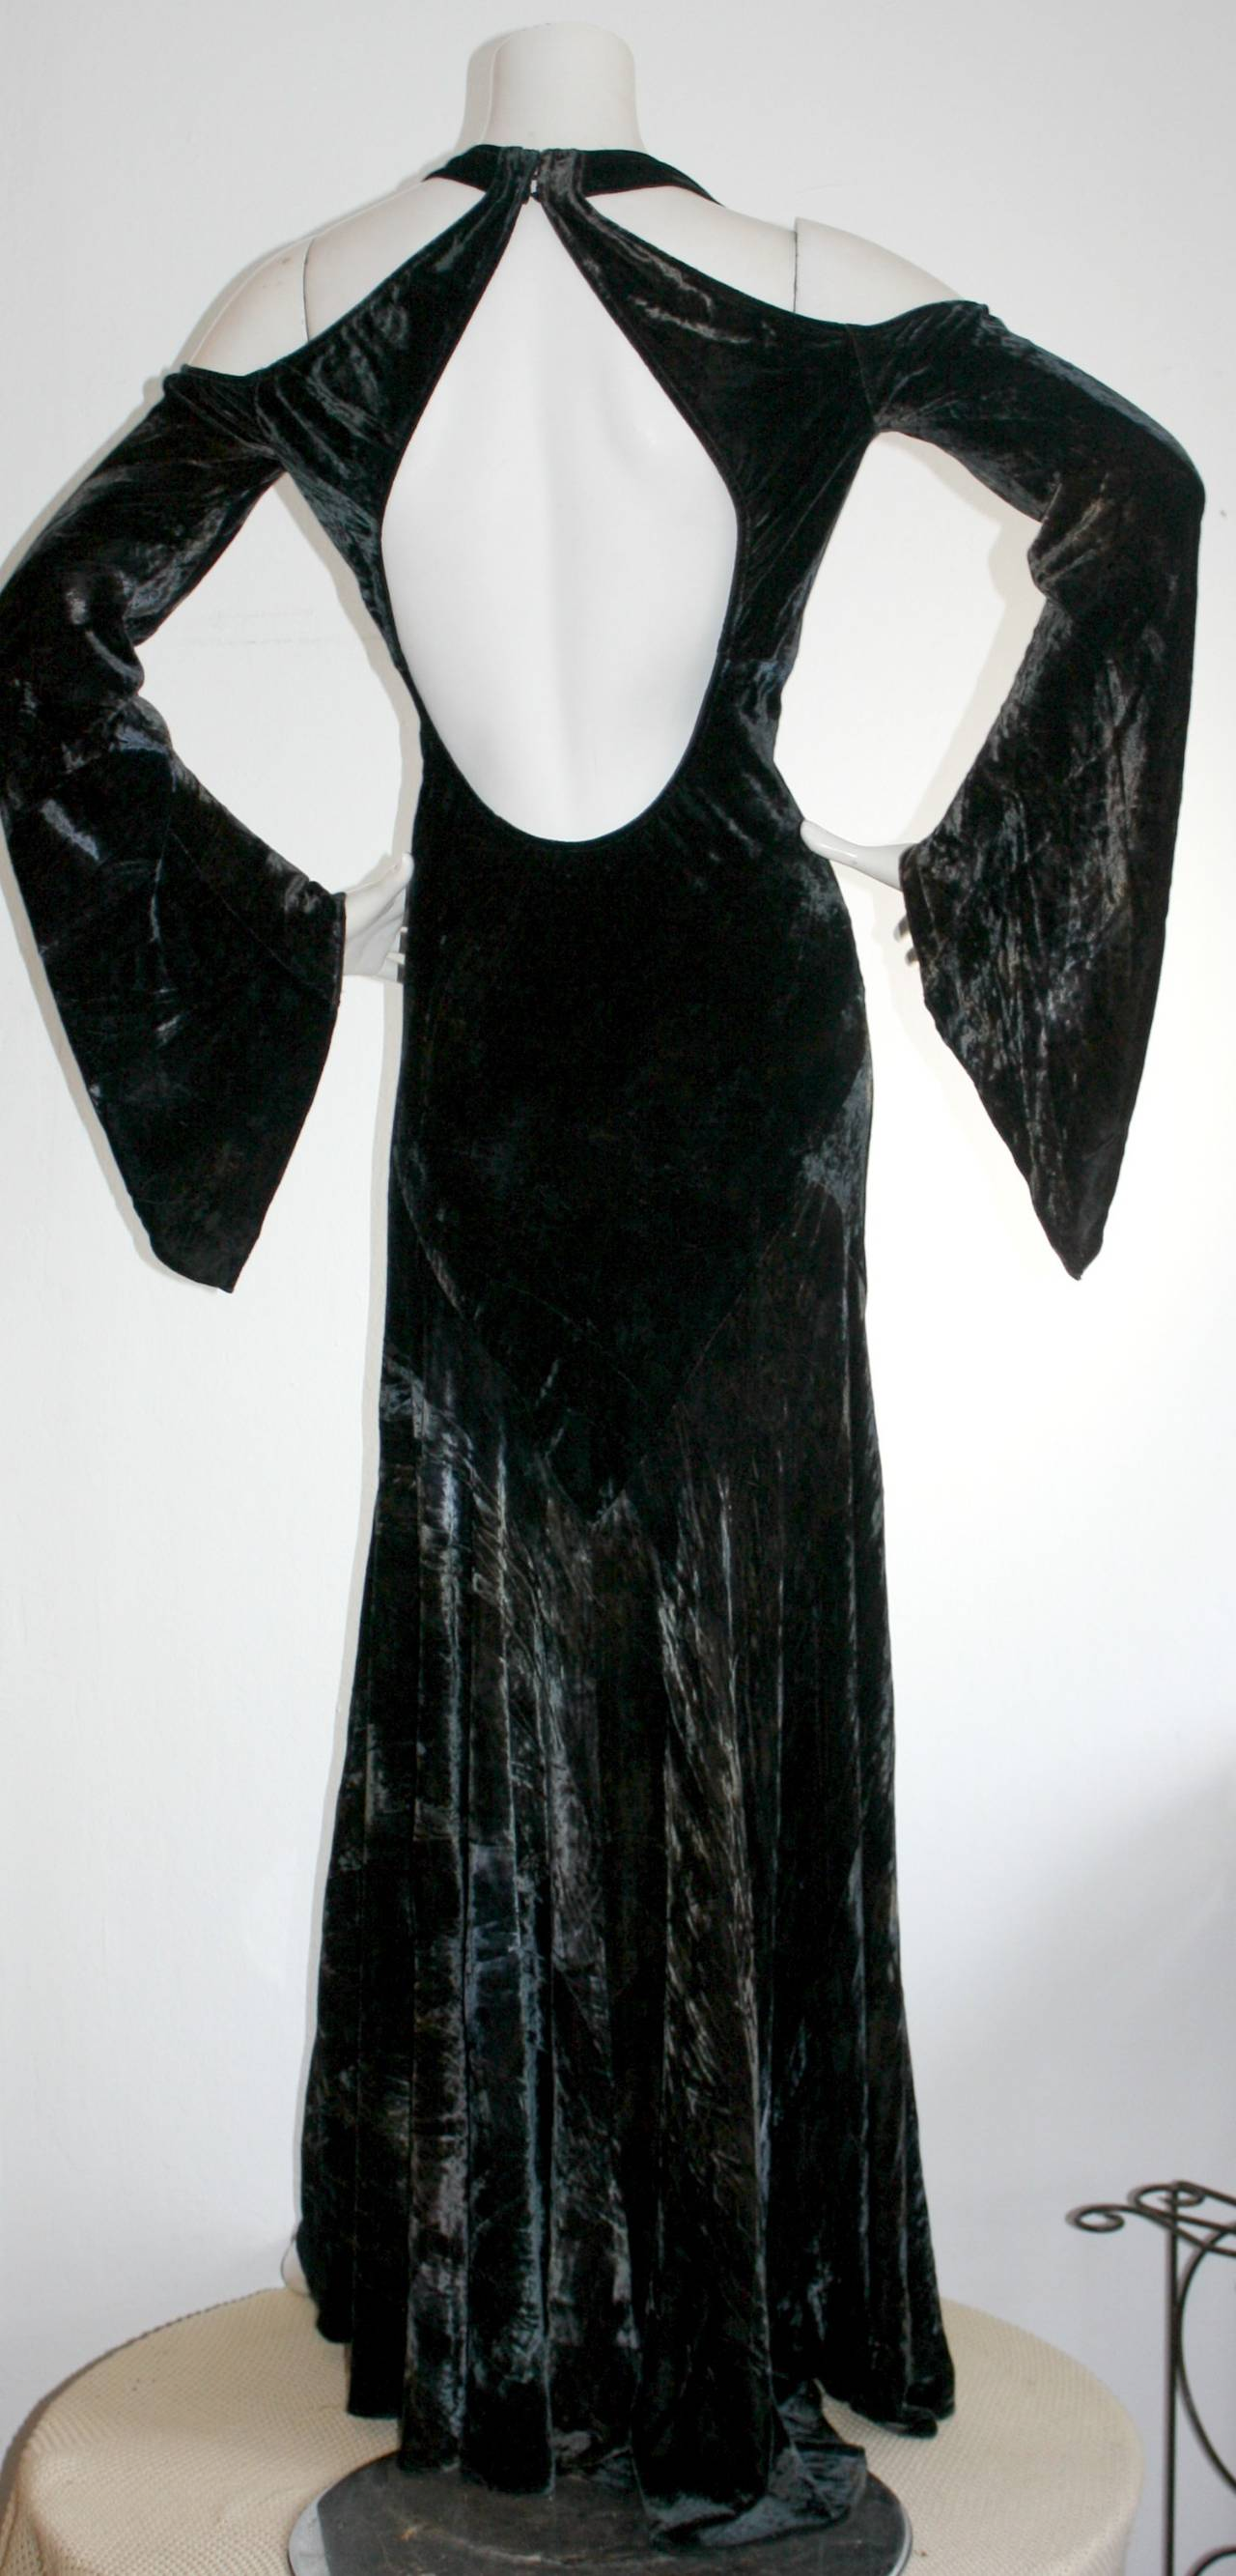 Vintage Donna Karan Ombré Crushed Velvet Blue & Green Open Back Runway Gown In Excellent Condition For Sale In San Francisco, CA